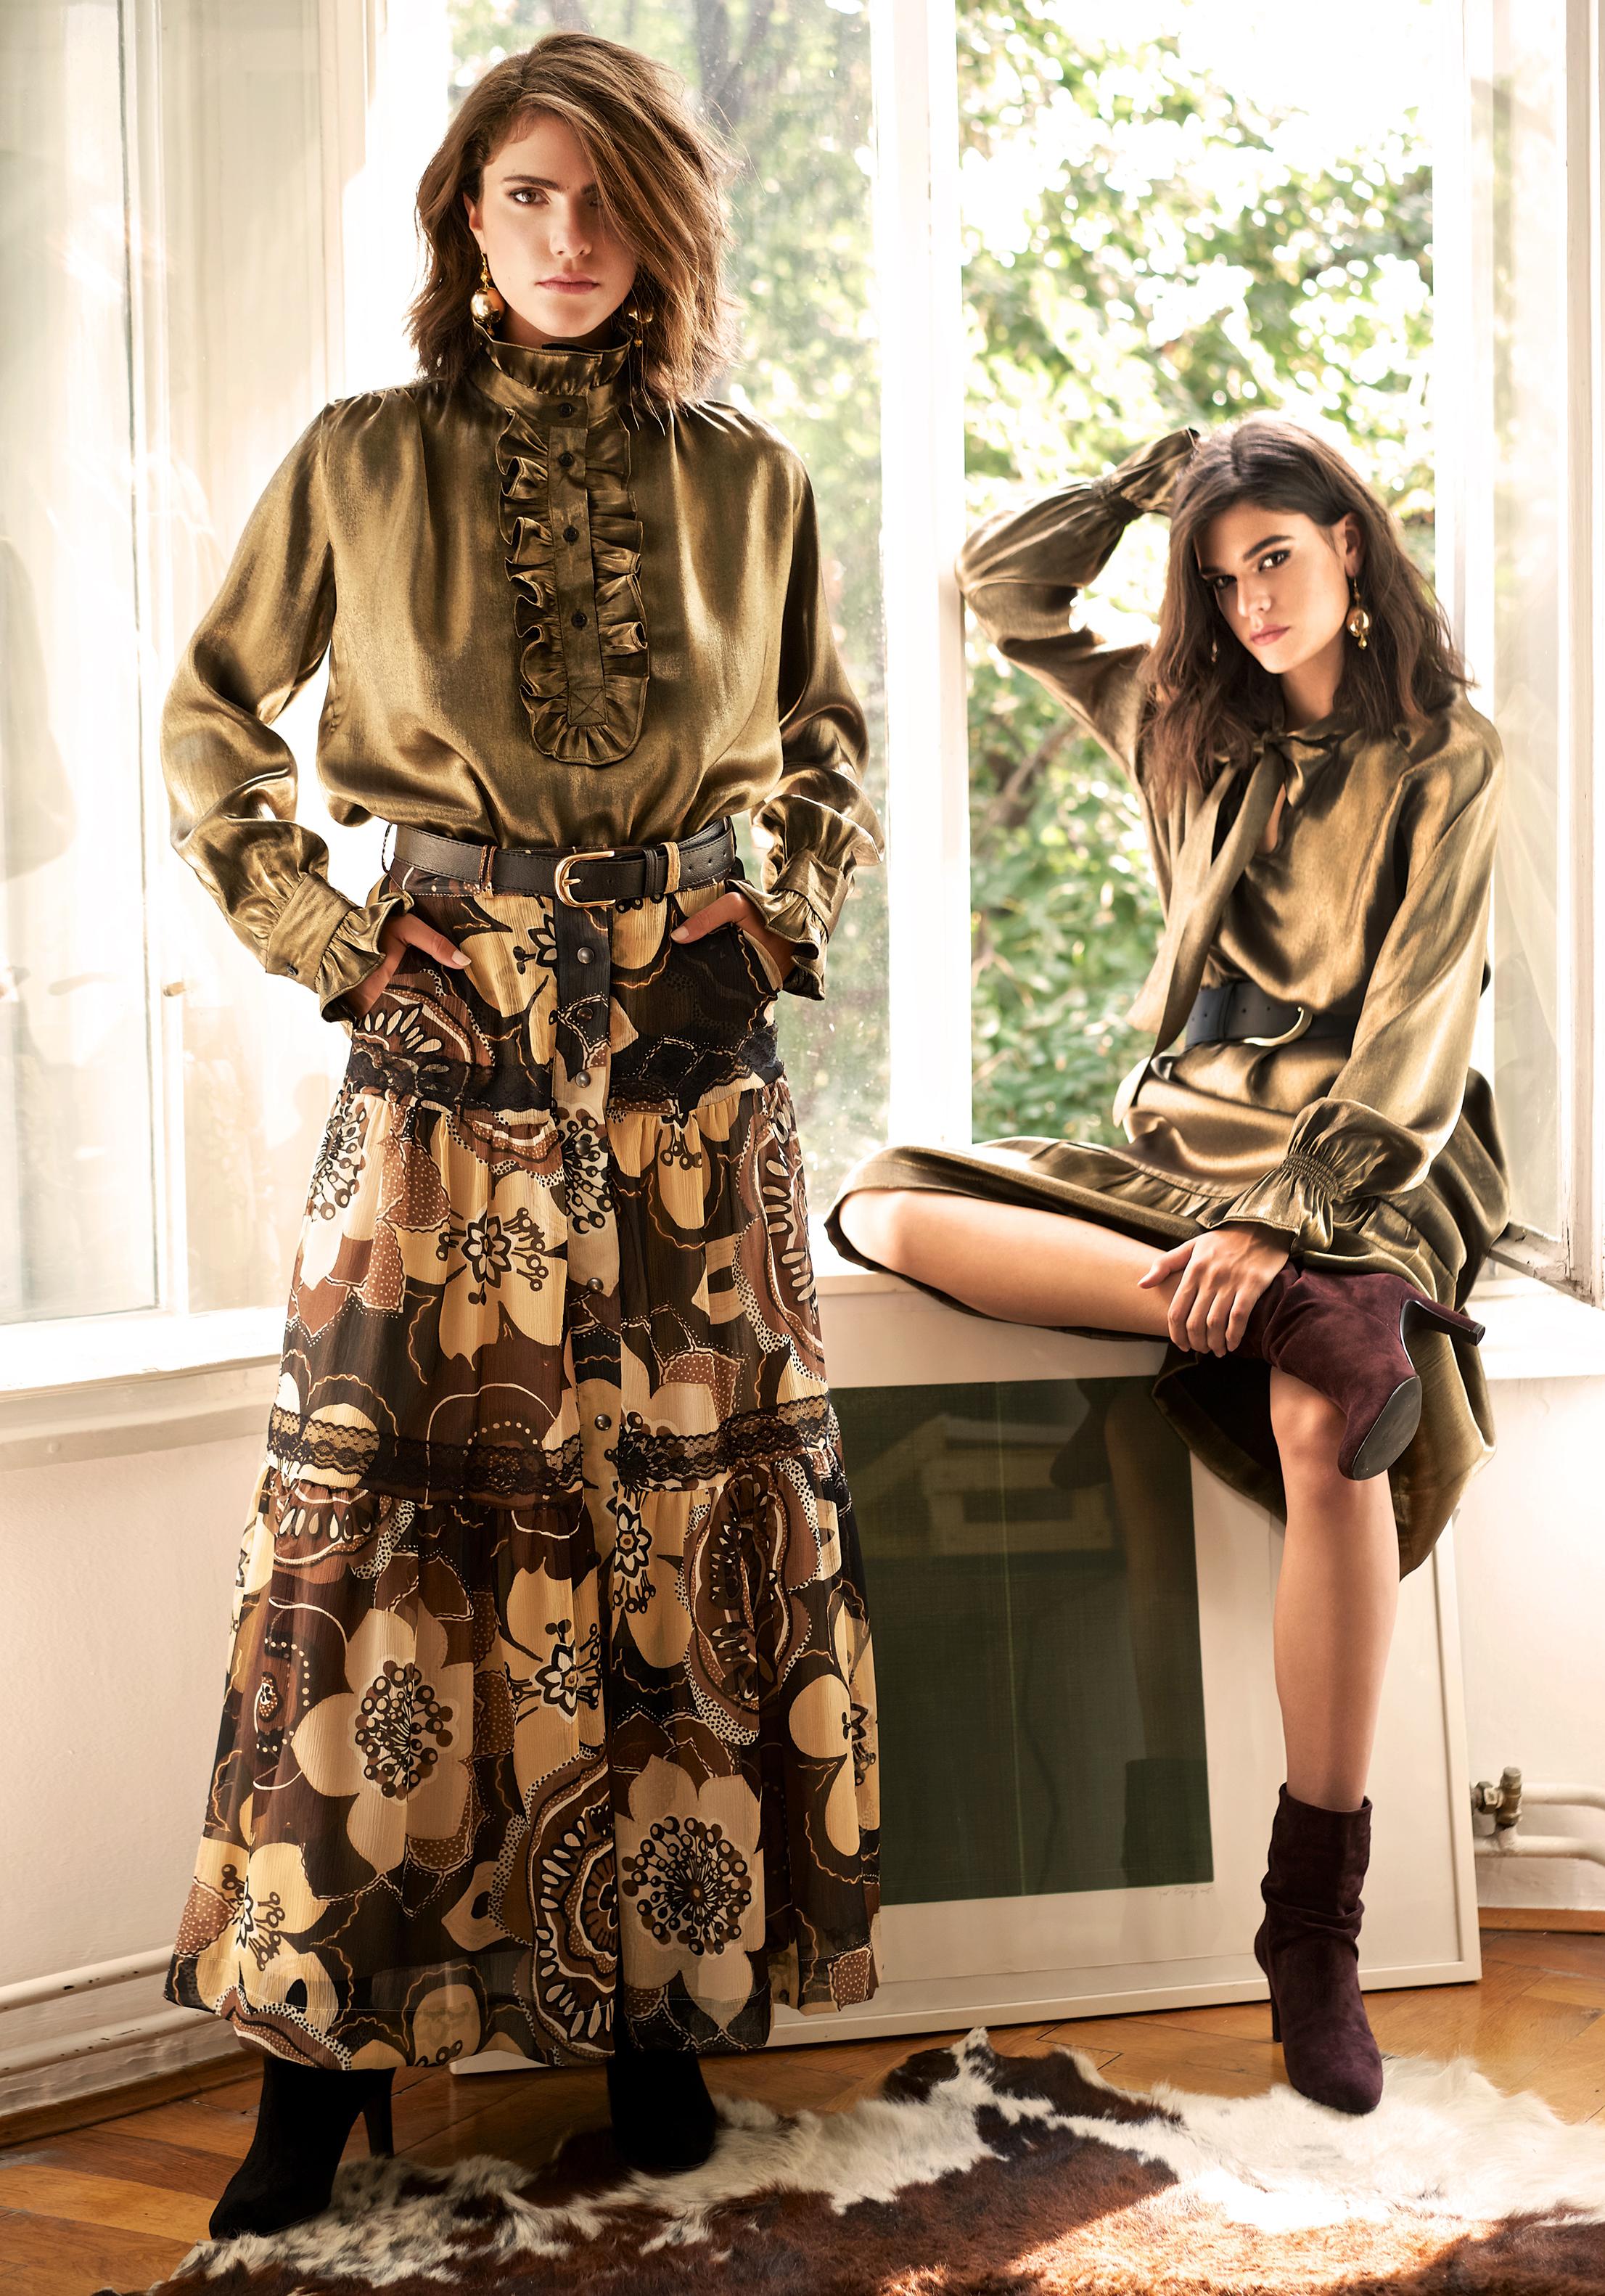 Košulja viskozni lame Sara 580 kn Suknja floralni print chiffon Ljubica 650 kn Haljina viskozni lame Belle 850 kn Remen široki kožni Anne 300 kn